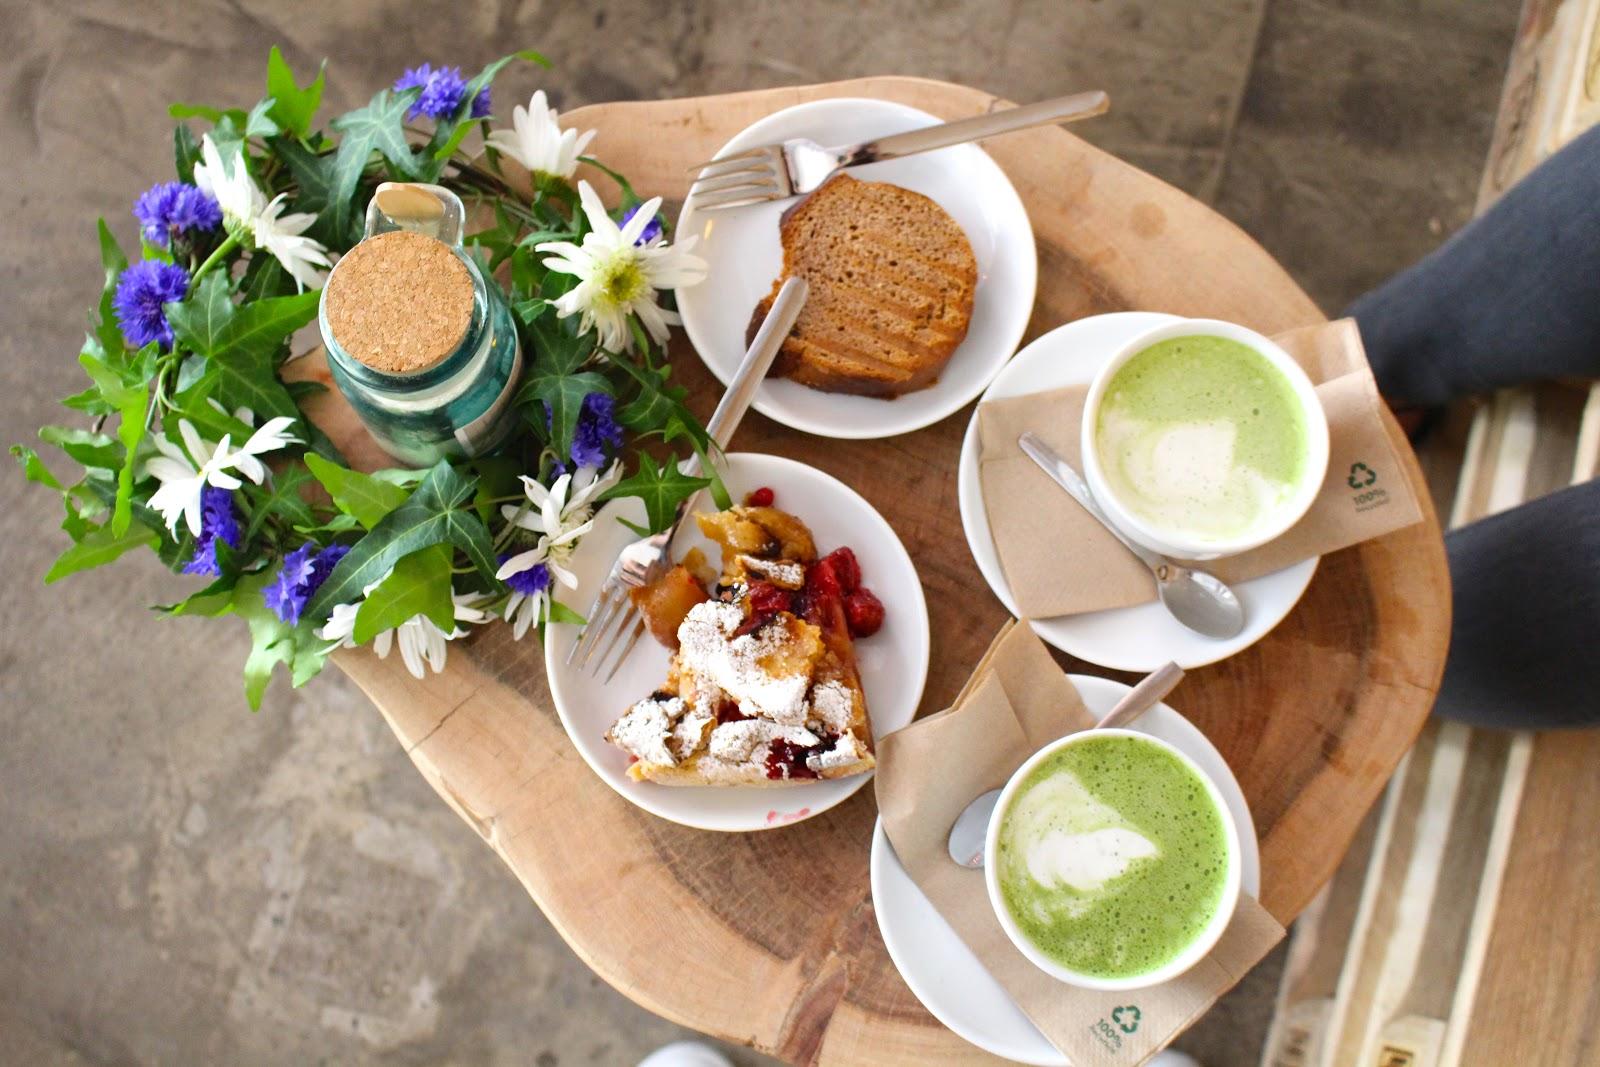 Little Kind Cafe Munich matcha latte vegan cakes banana bread